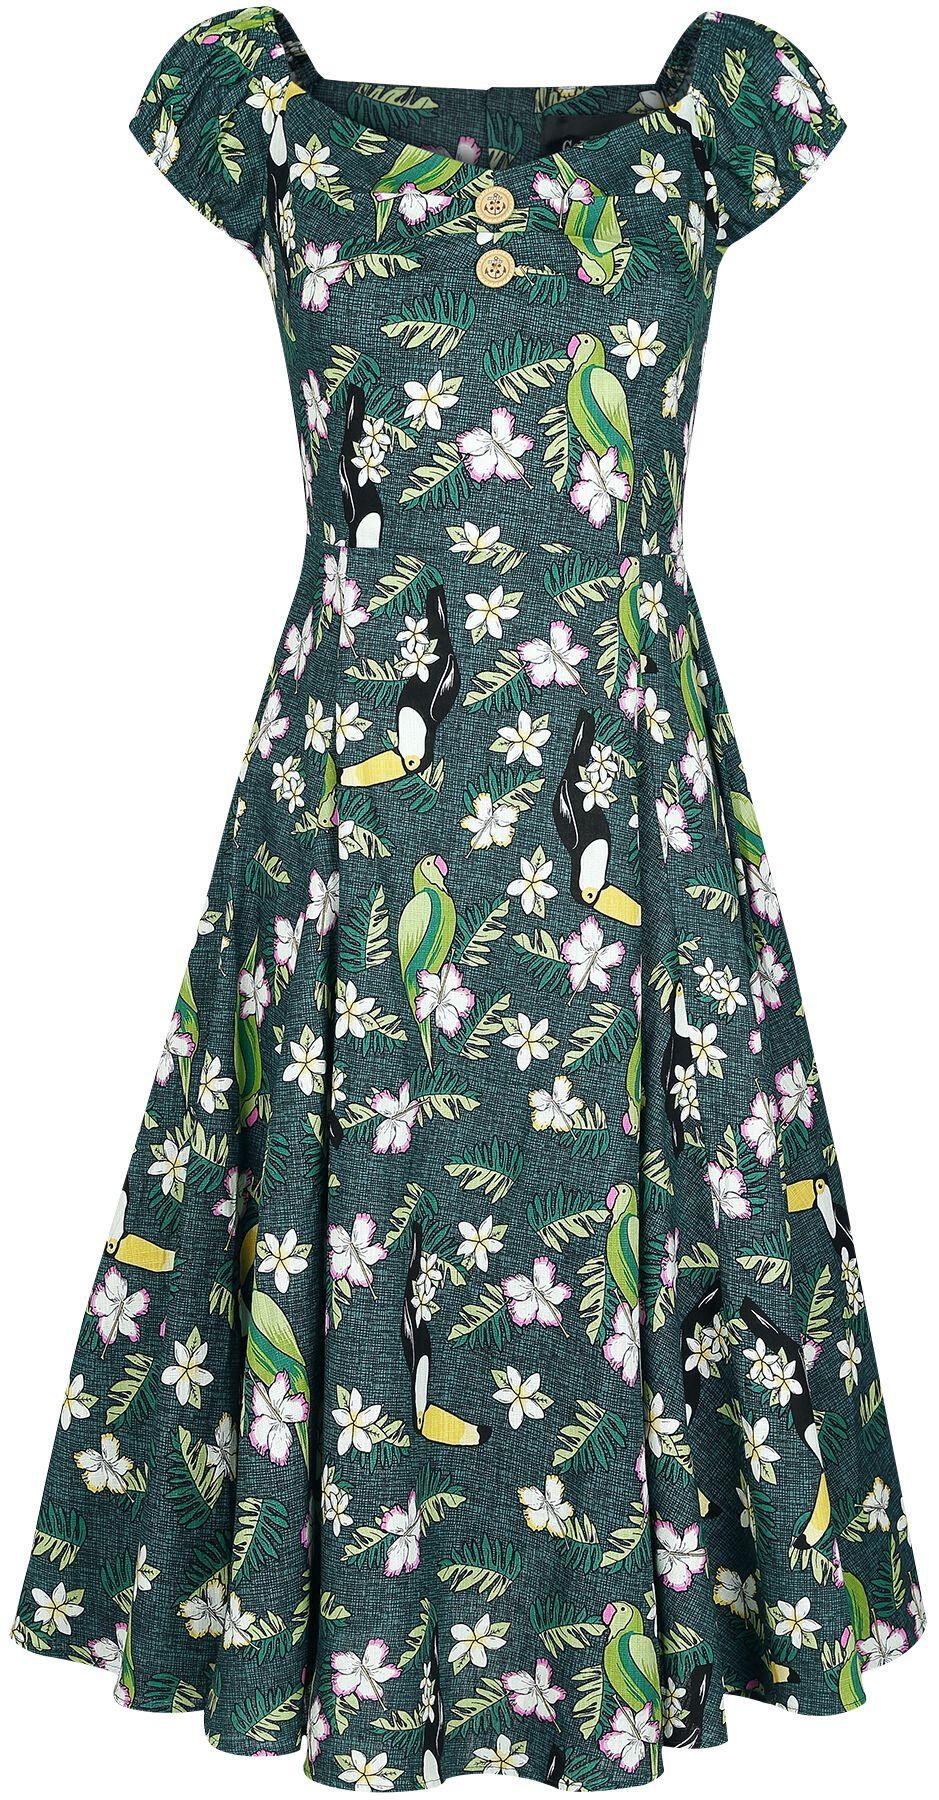 Collectif Clothing Dolores Tropical Bird Doll Dress Sukienka wielokolorowy